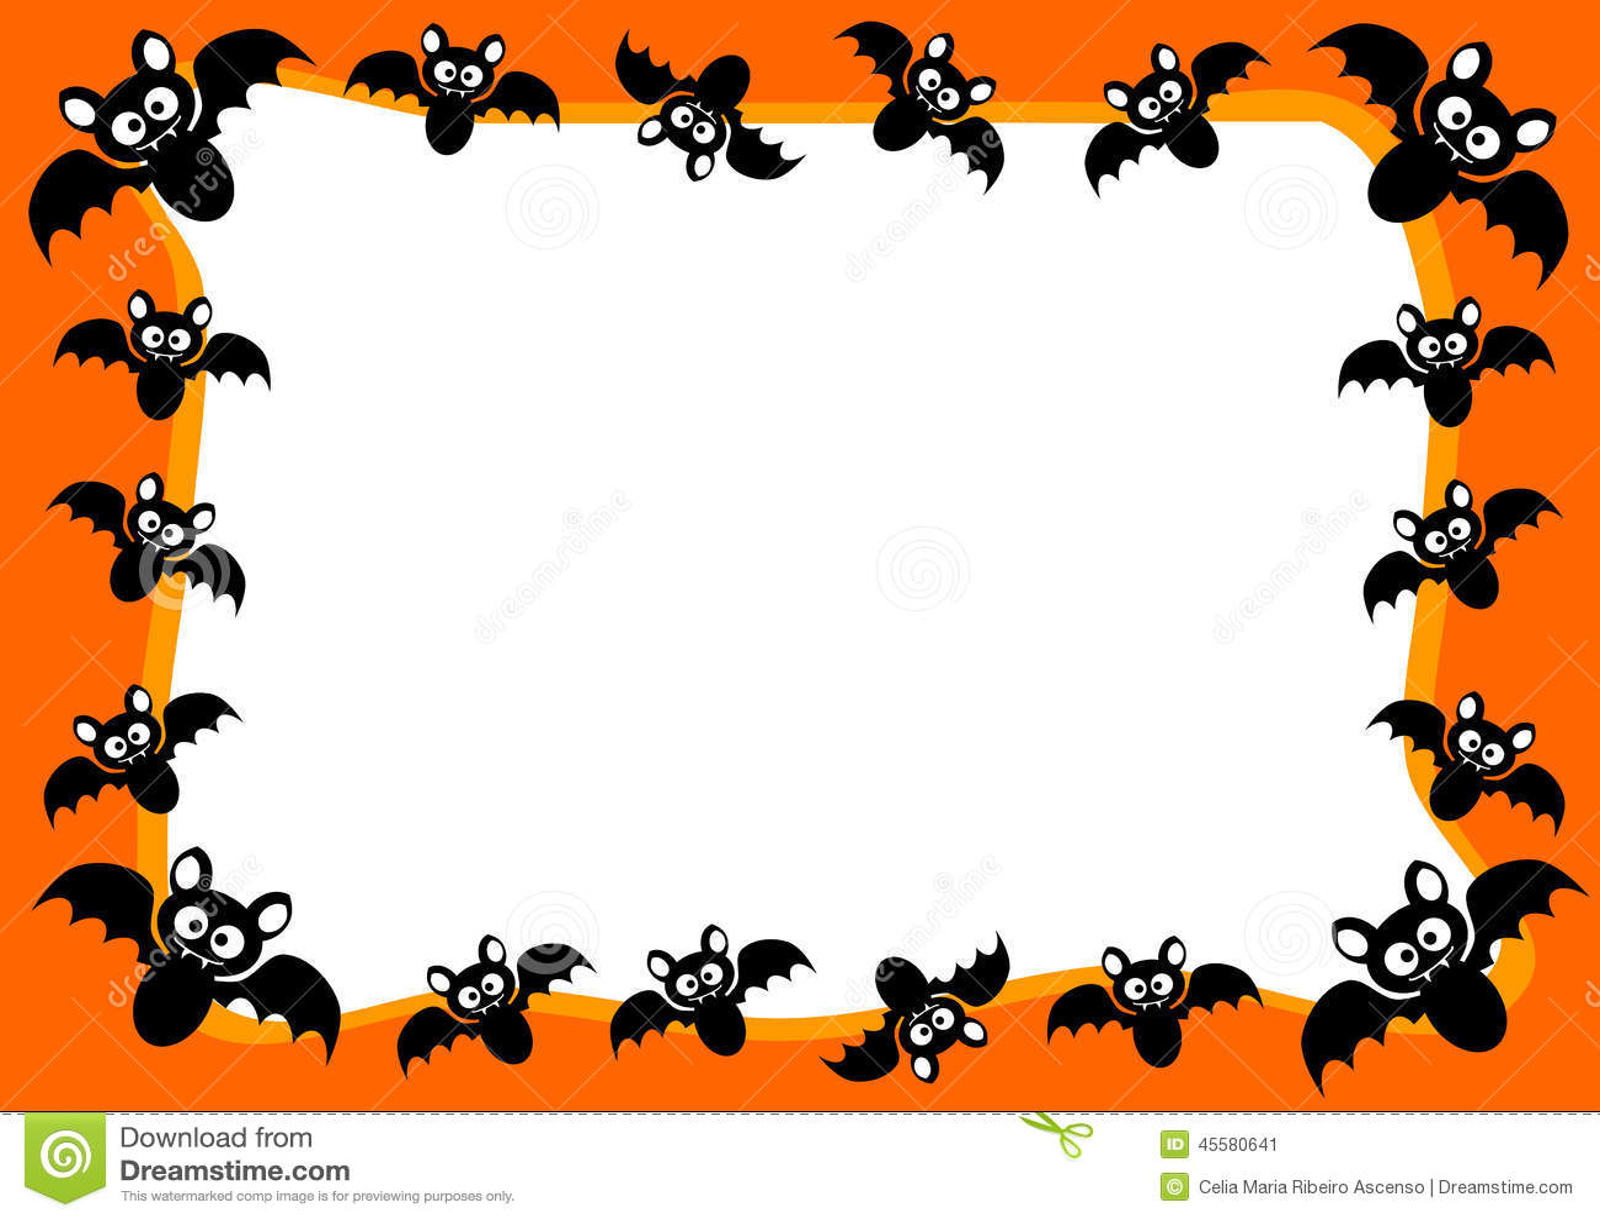 Halloween invitation card flying bats frame stock illustration halloween invitation card flying bats frame stopboris Images